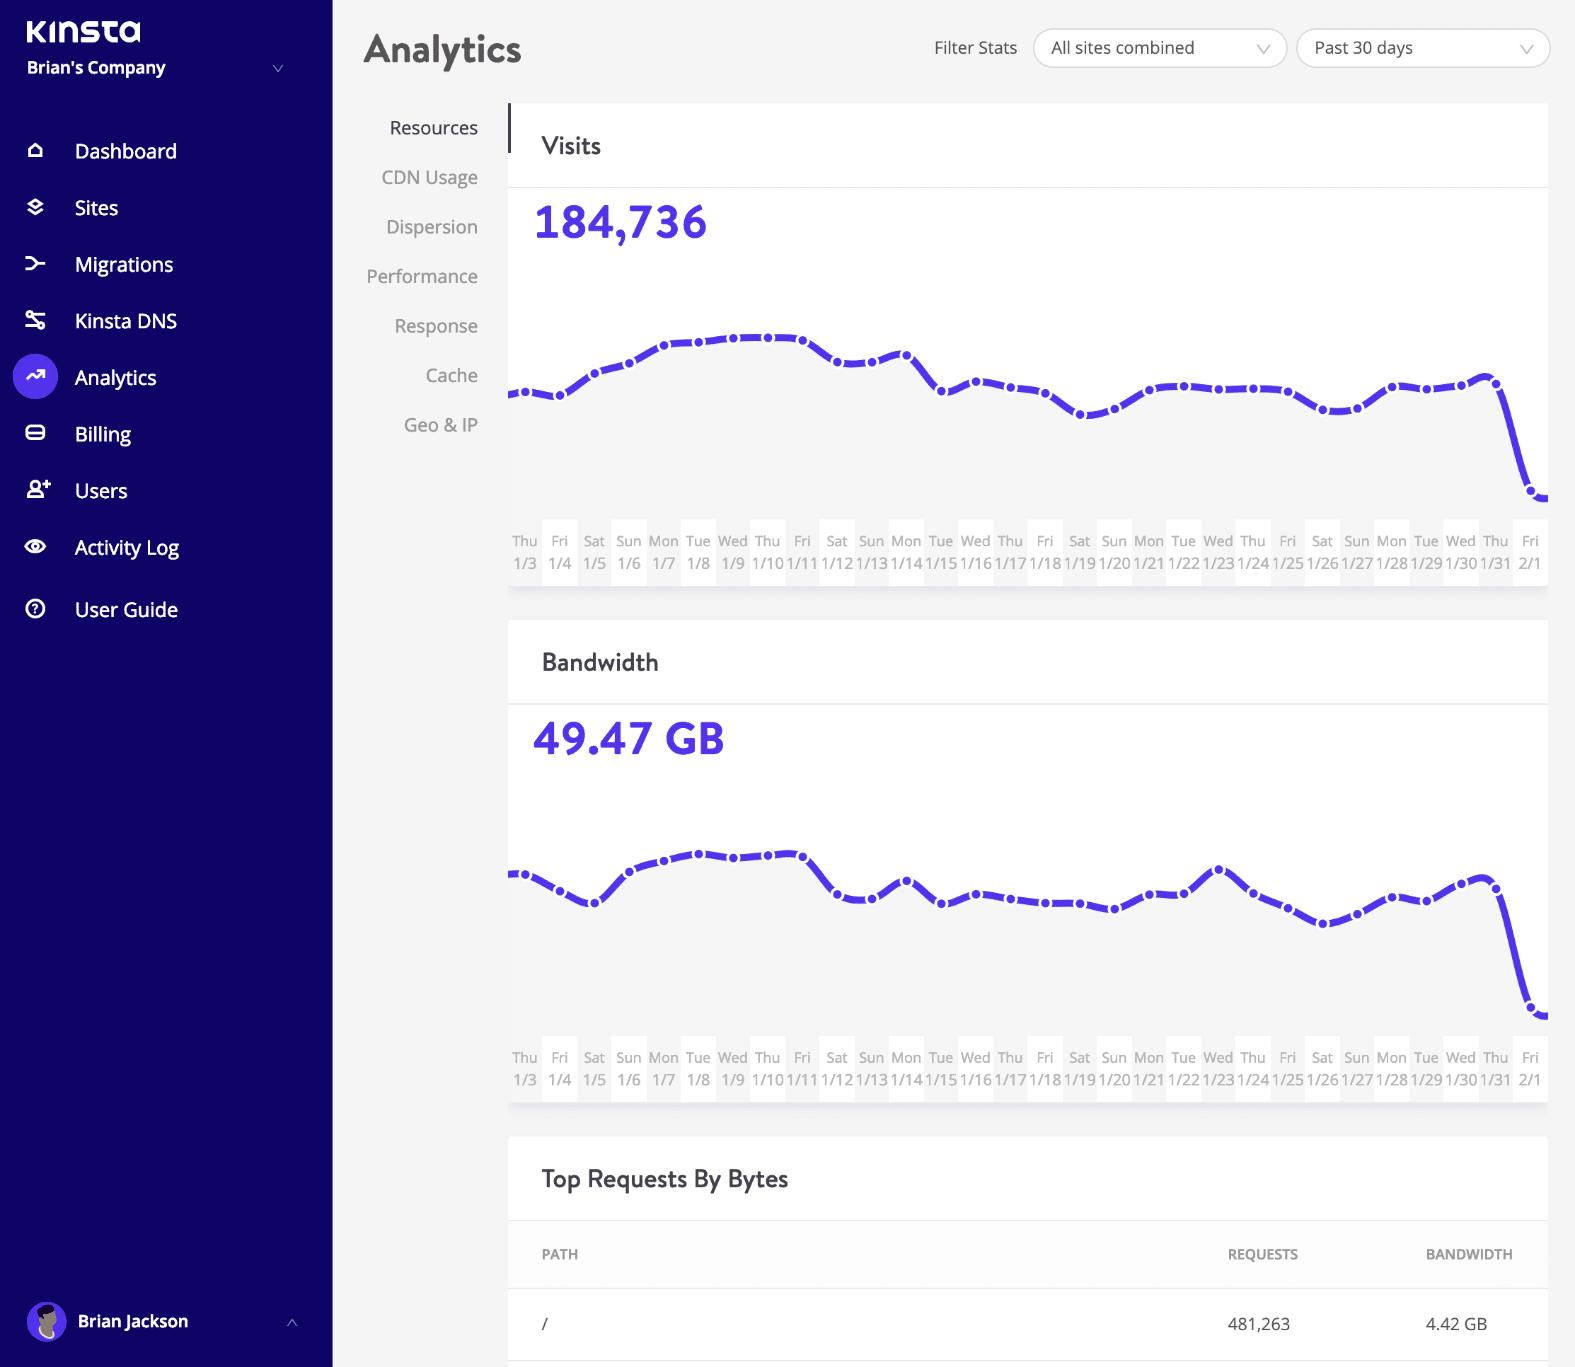 Analytics de uso de recursos